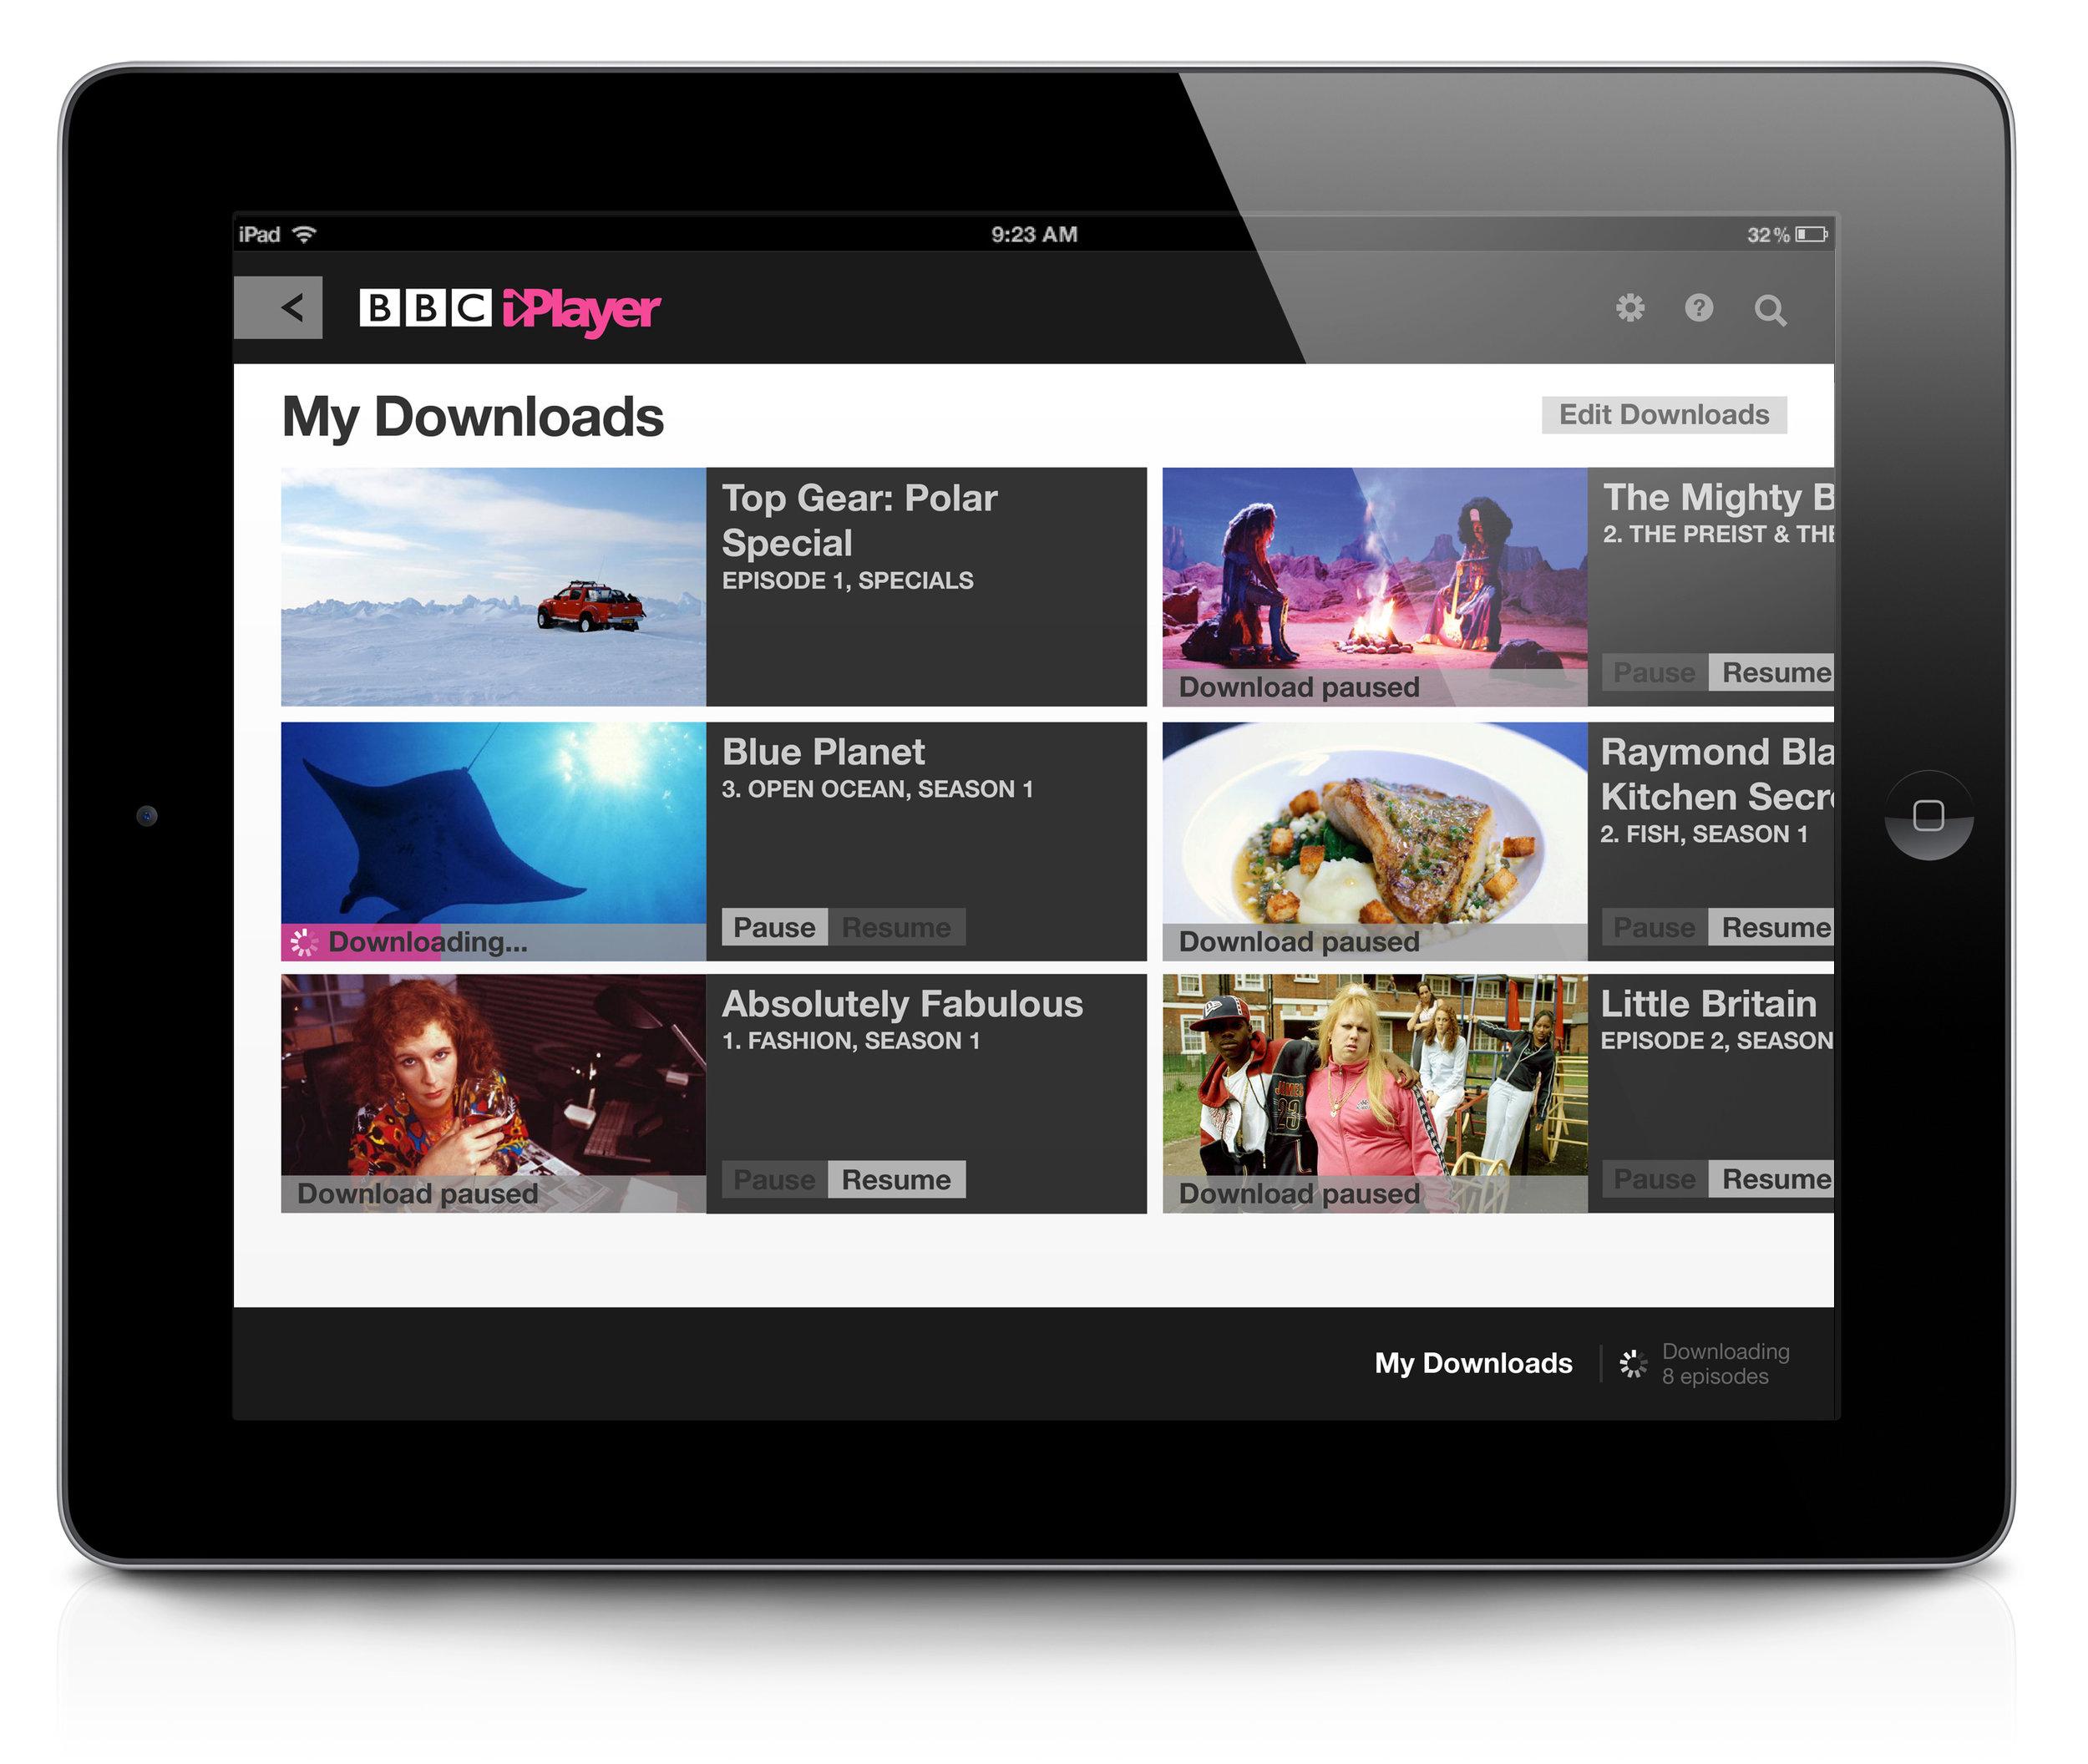 iPlayer_iPad2_downloads.jpg